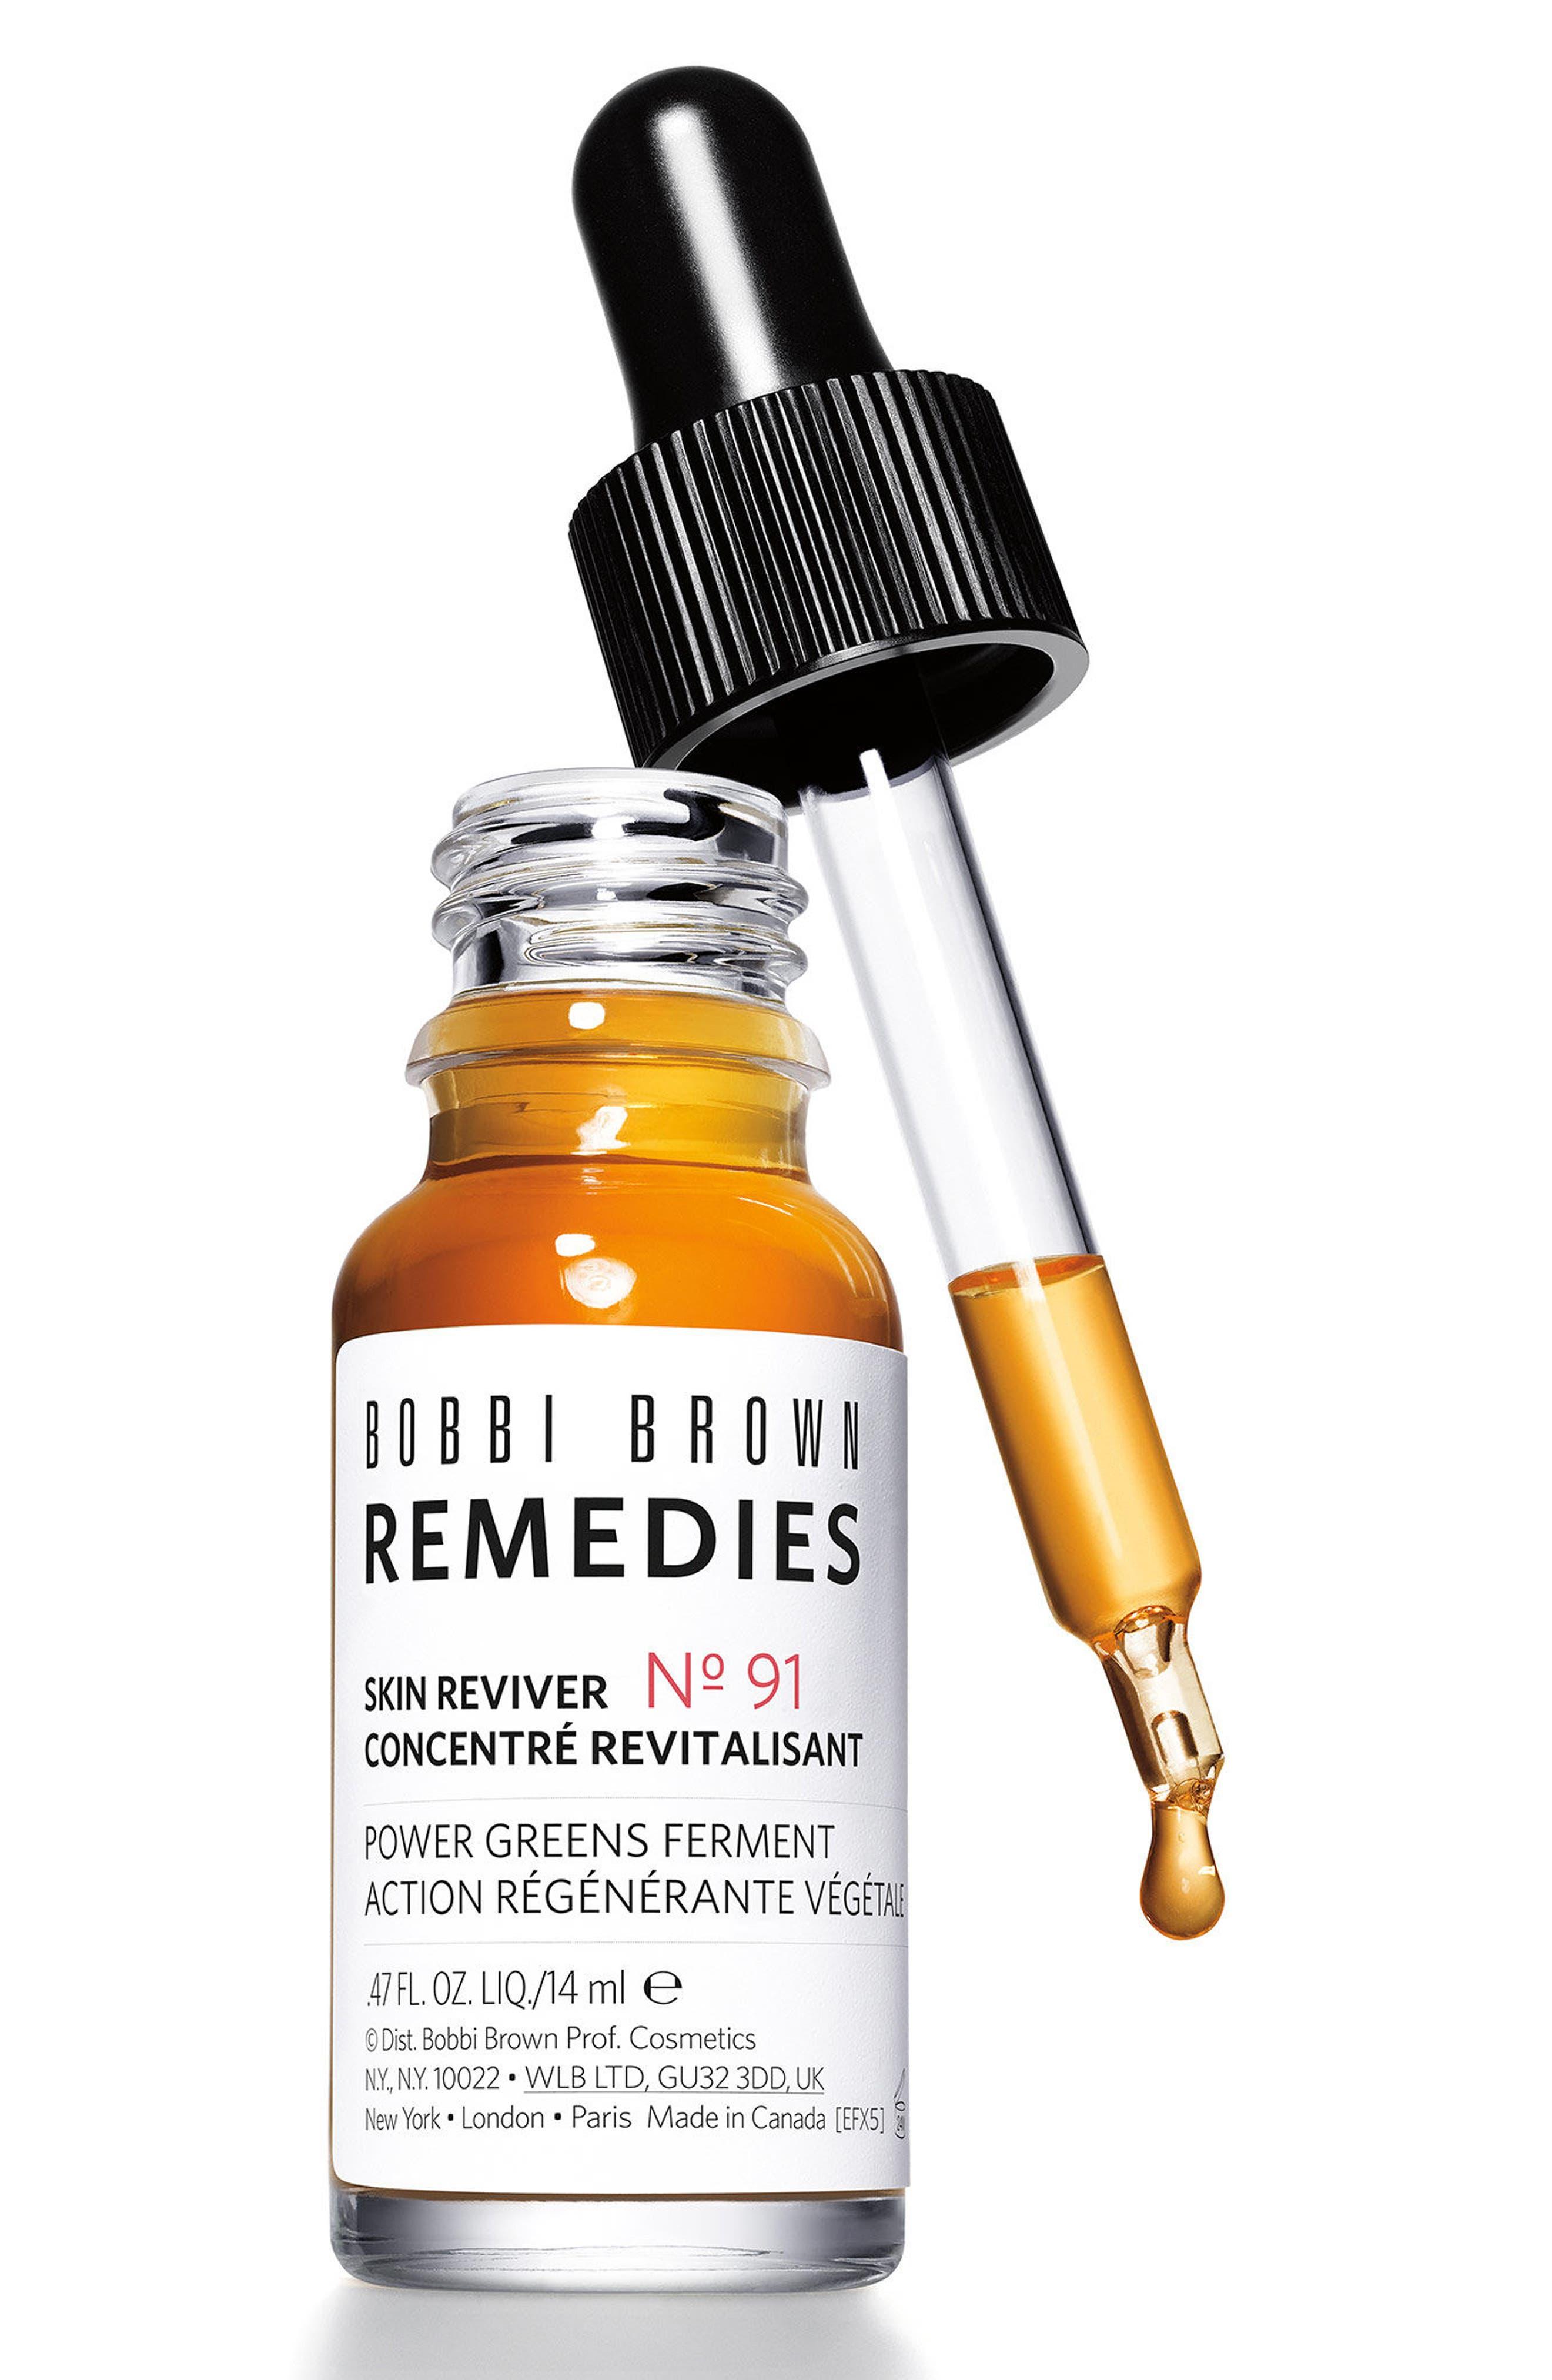 Bobbi Brown Remedies Skin Reviver Power Greens Ferment